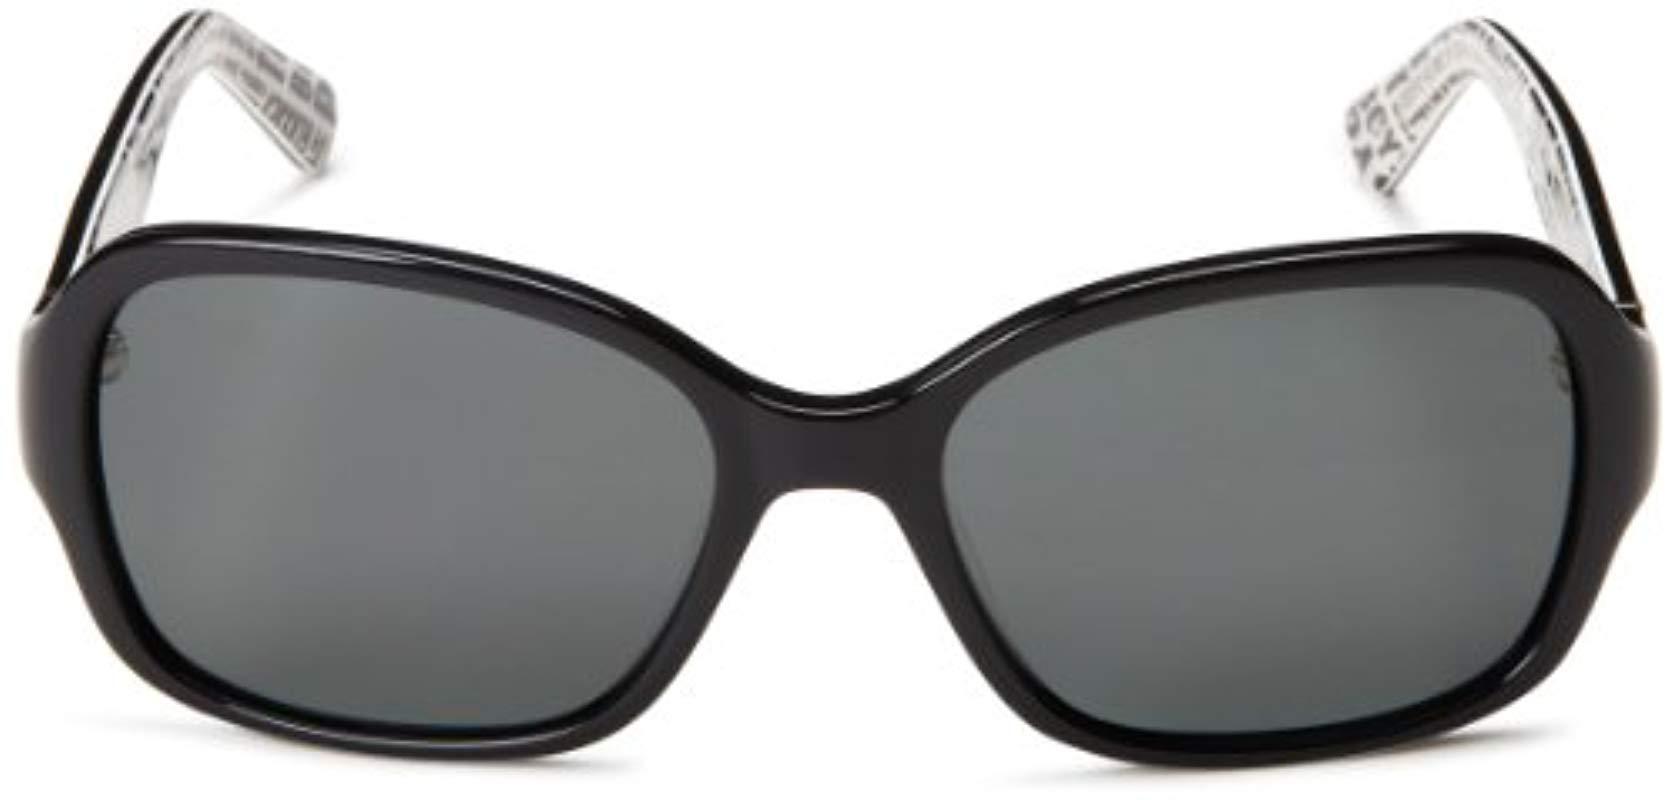 211ed0229b1bc Kate Spade - Black Akira Polarized Rectangular Sunglasses - Lyst. View  fullscreen